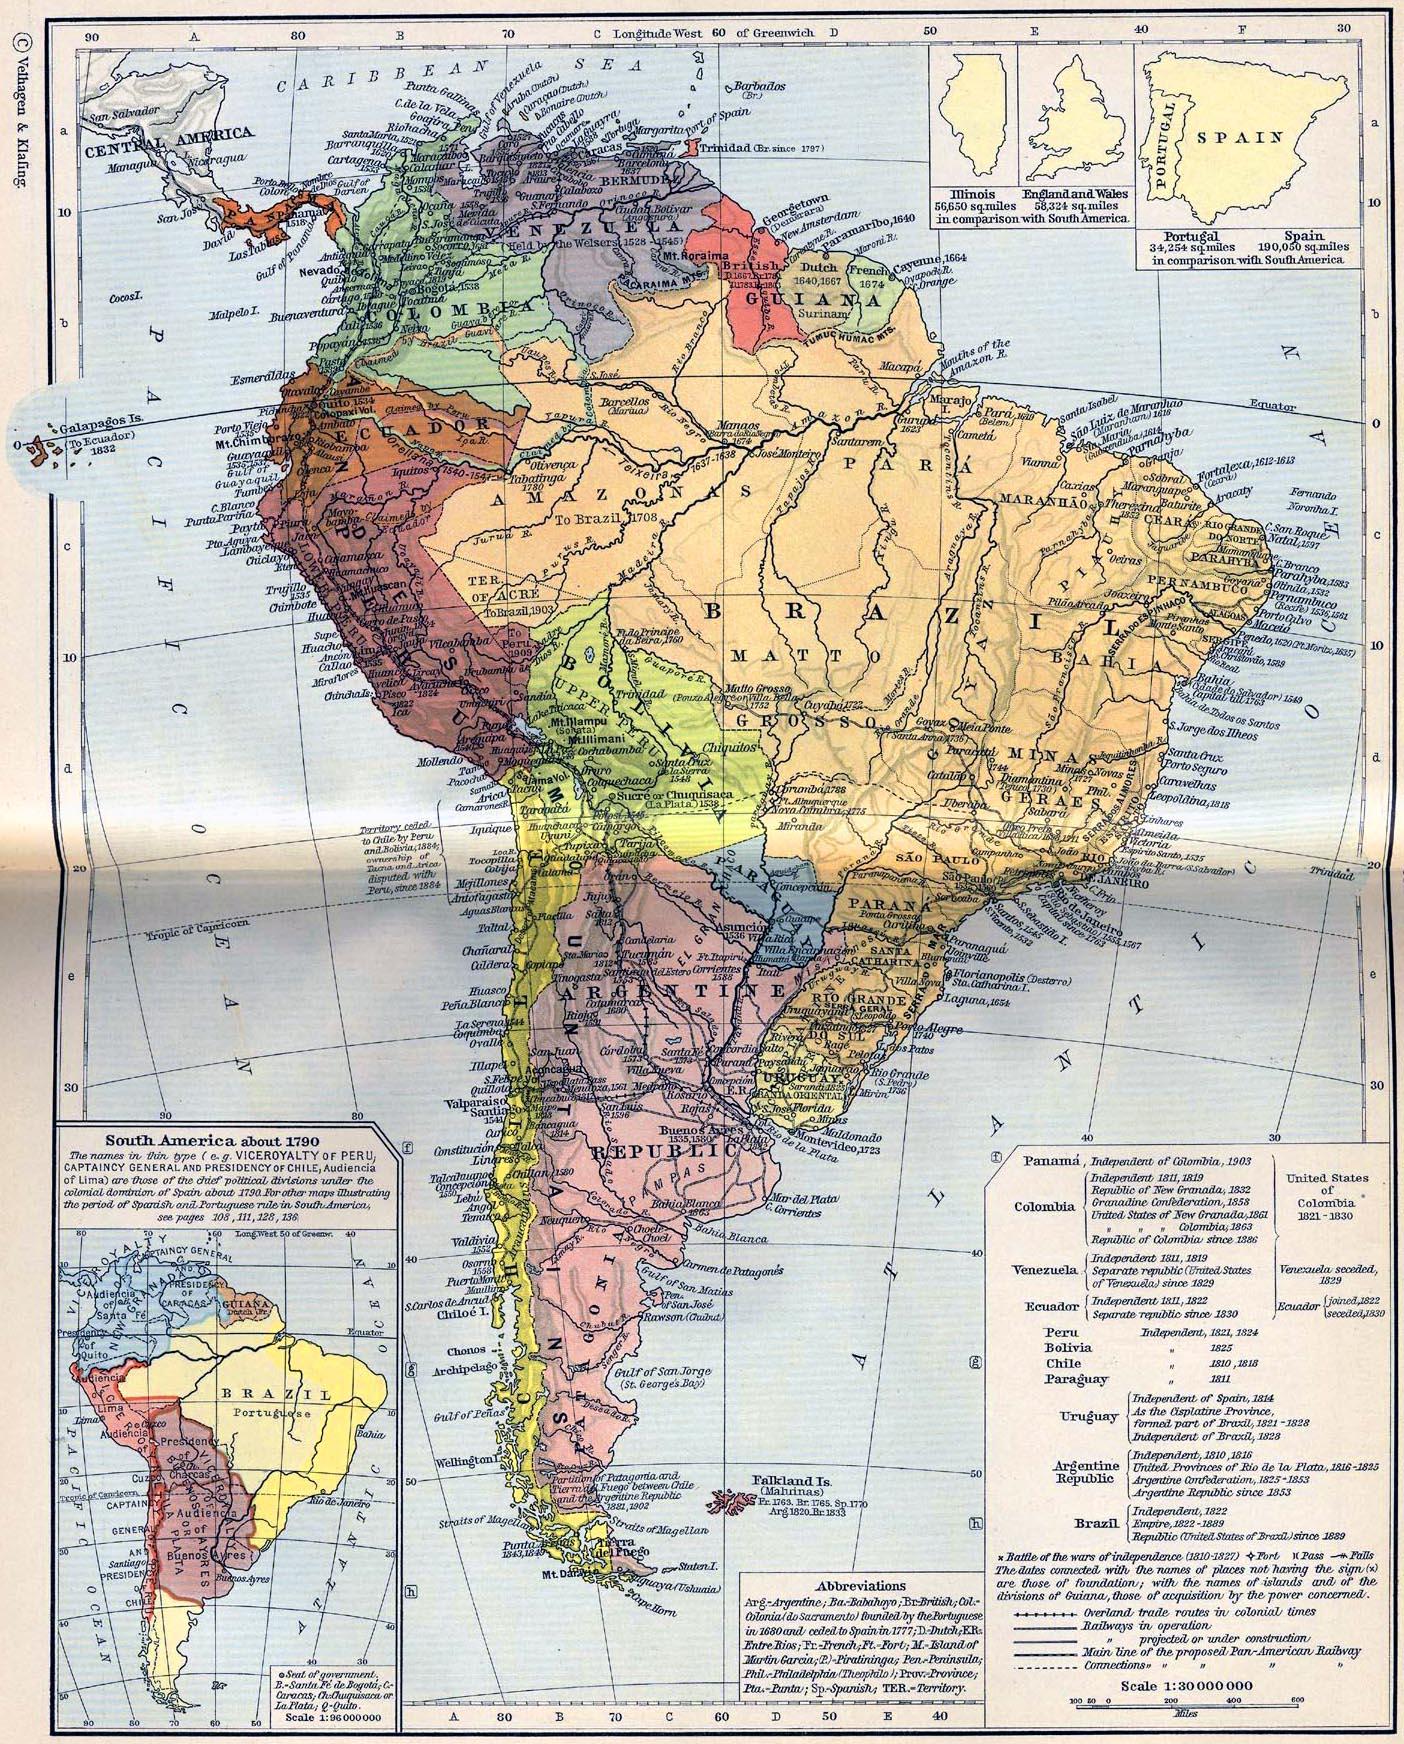 South America circa 1790